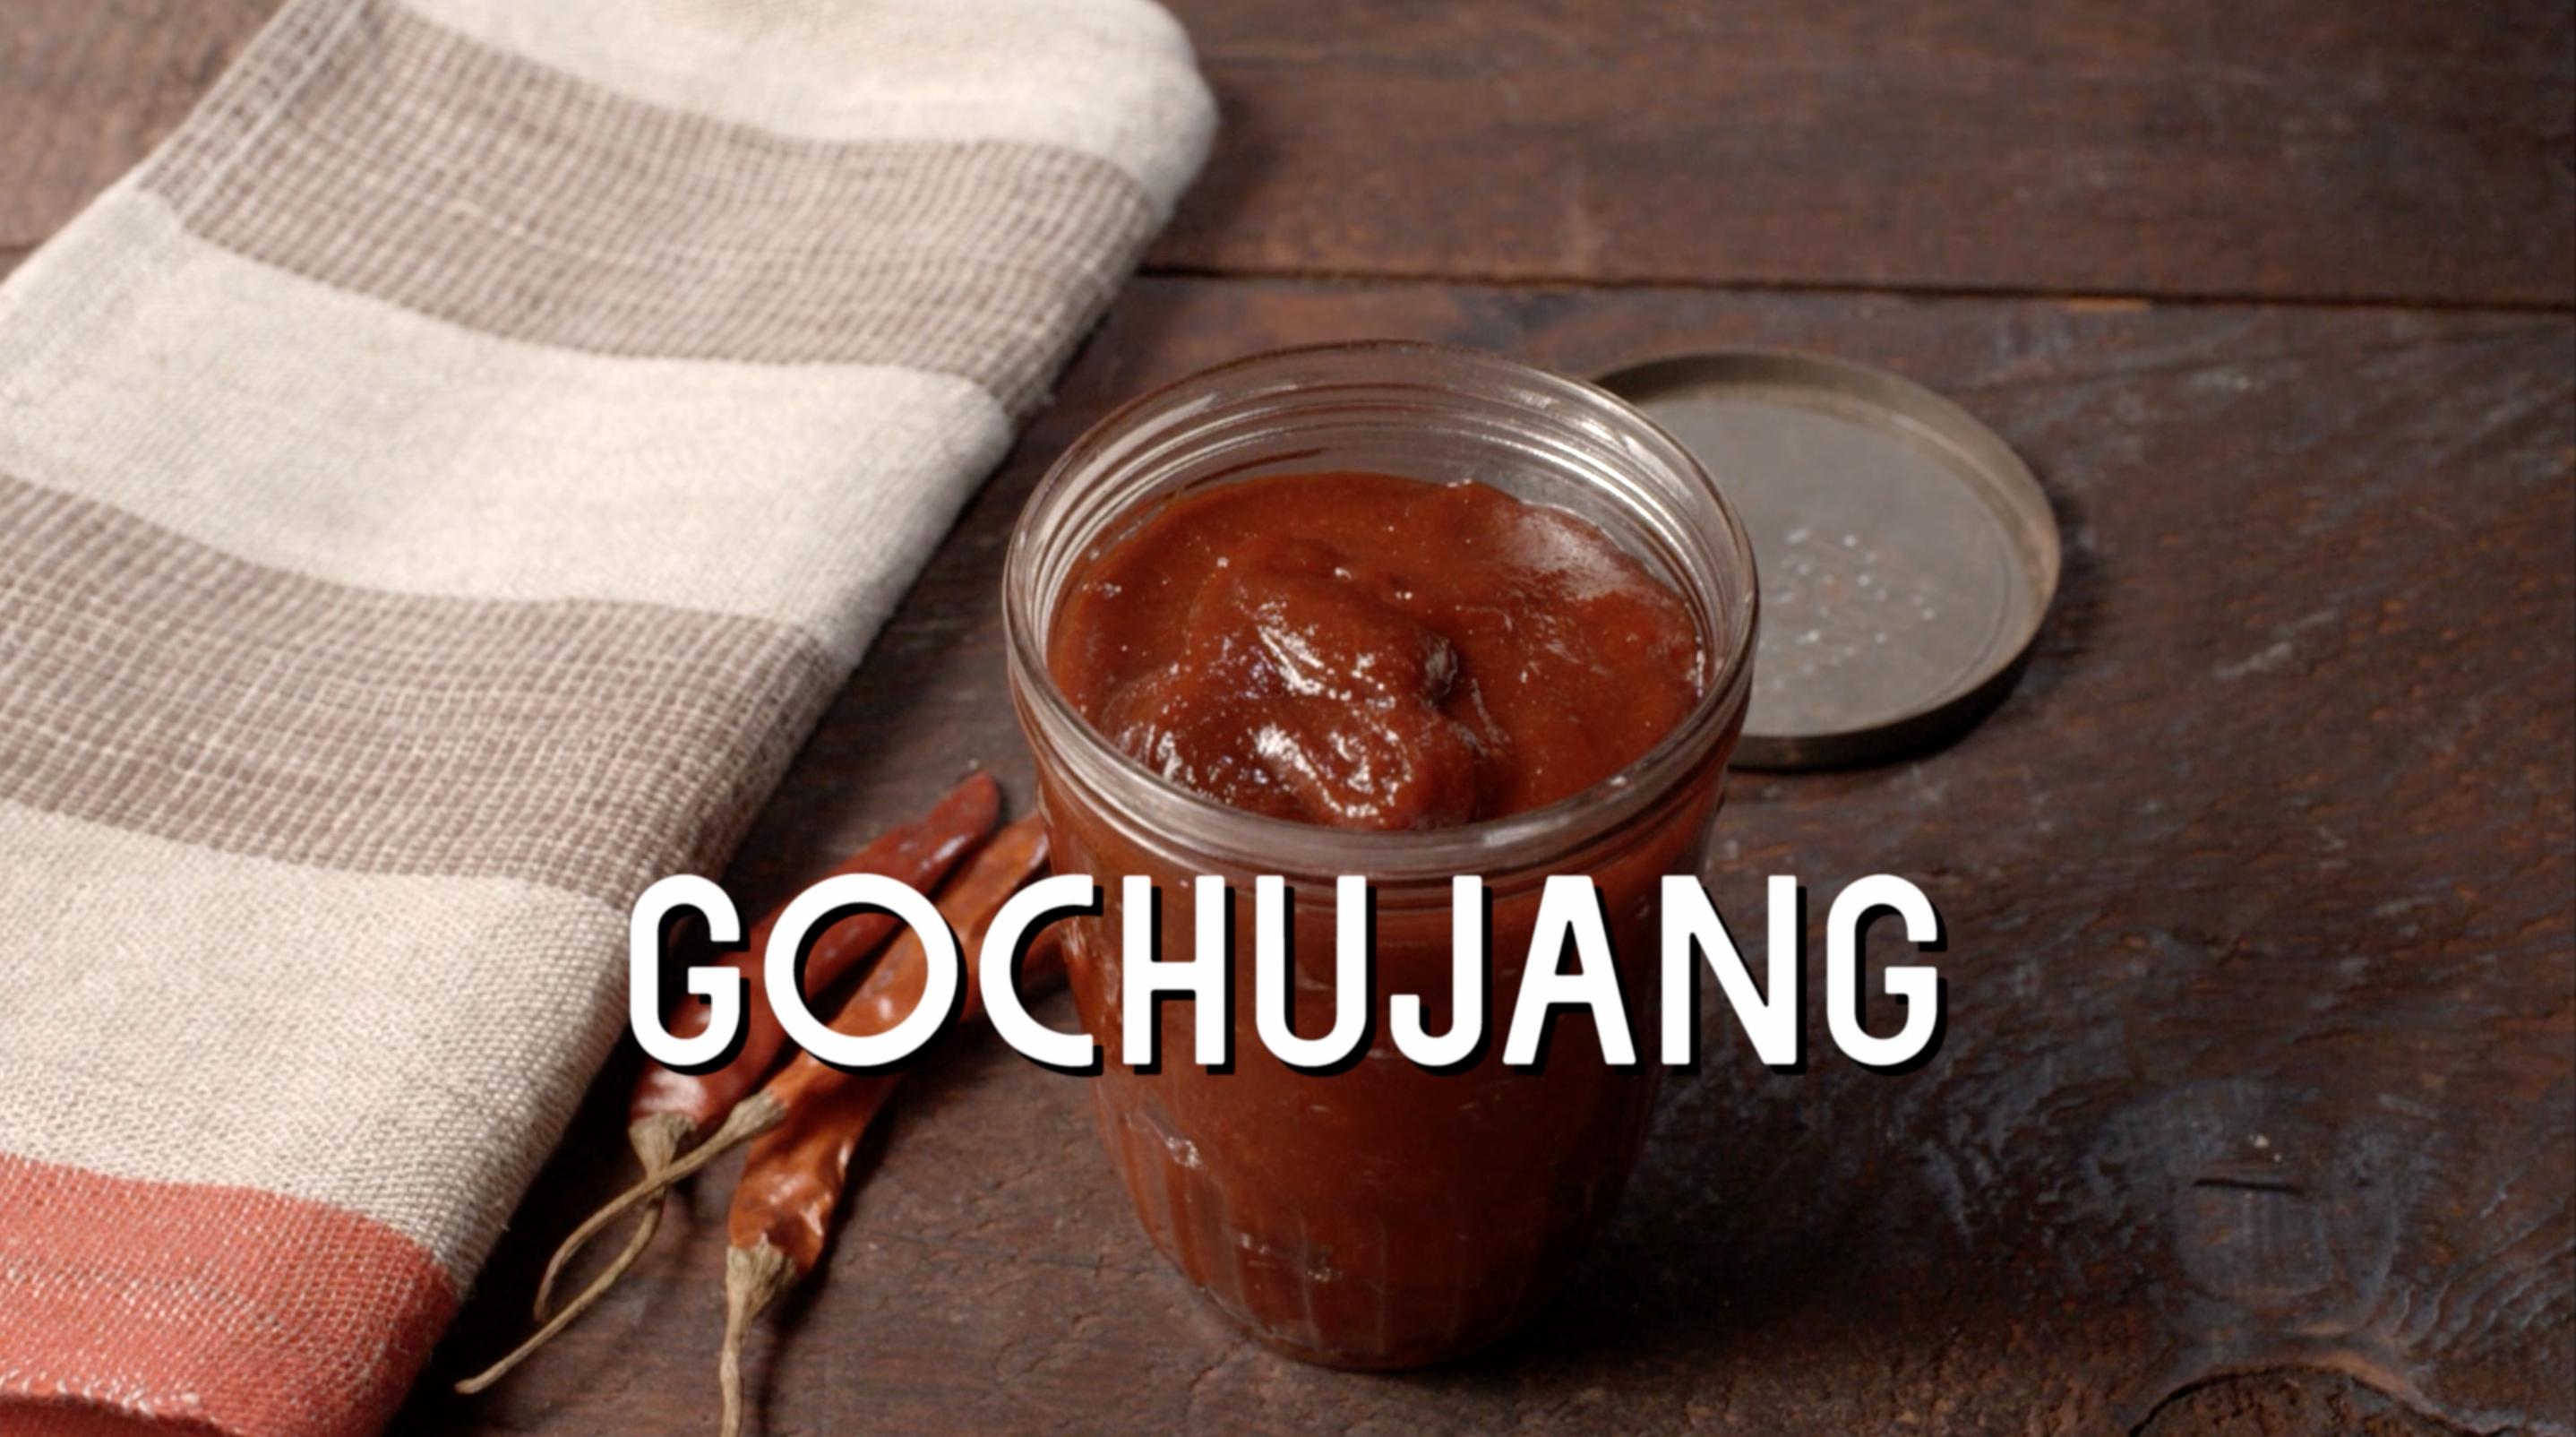 Gochujang